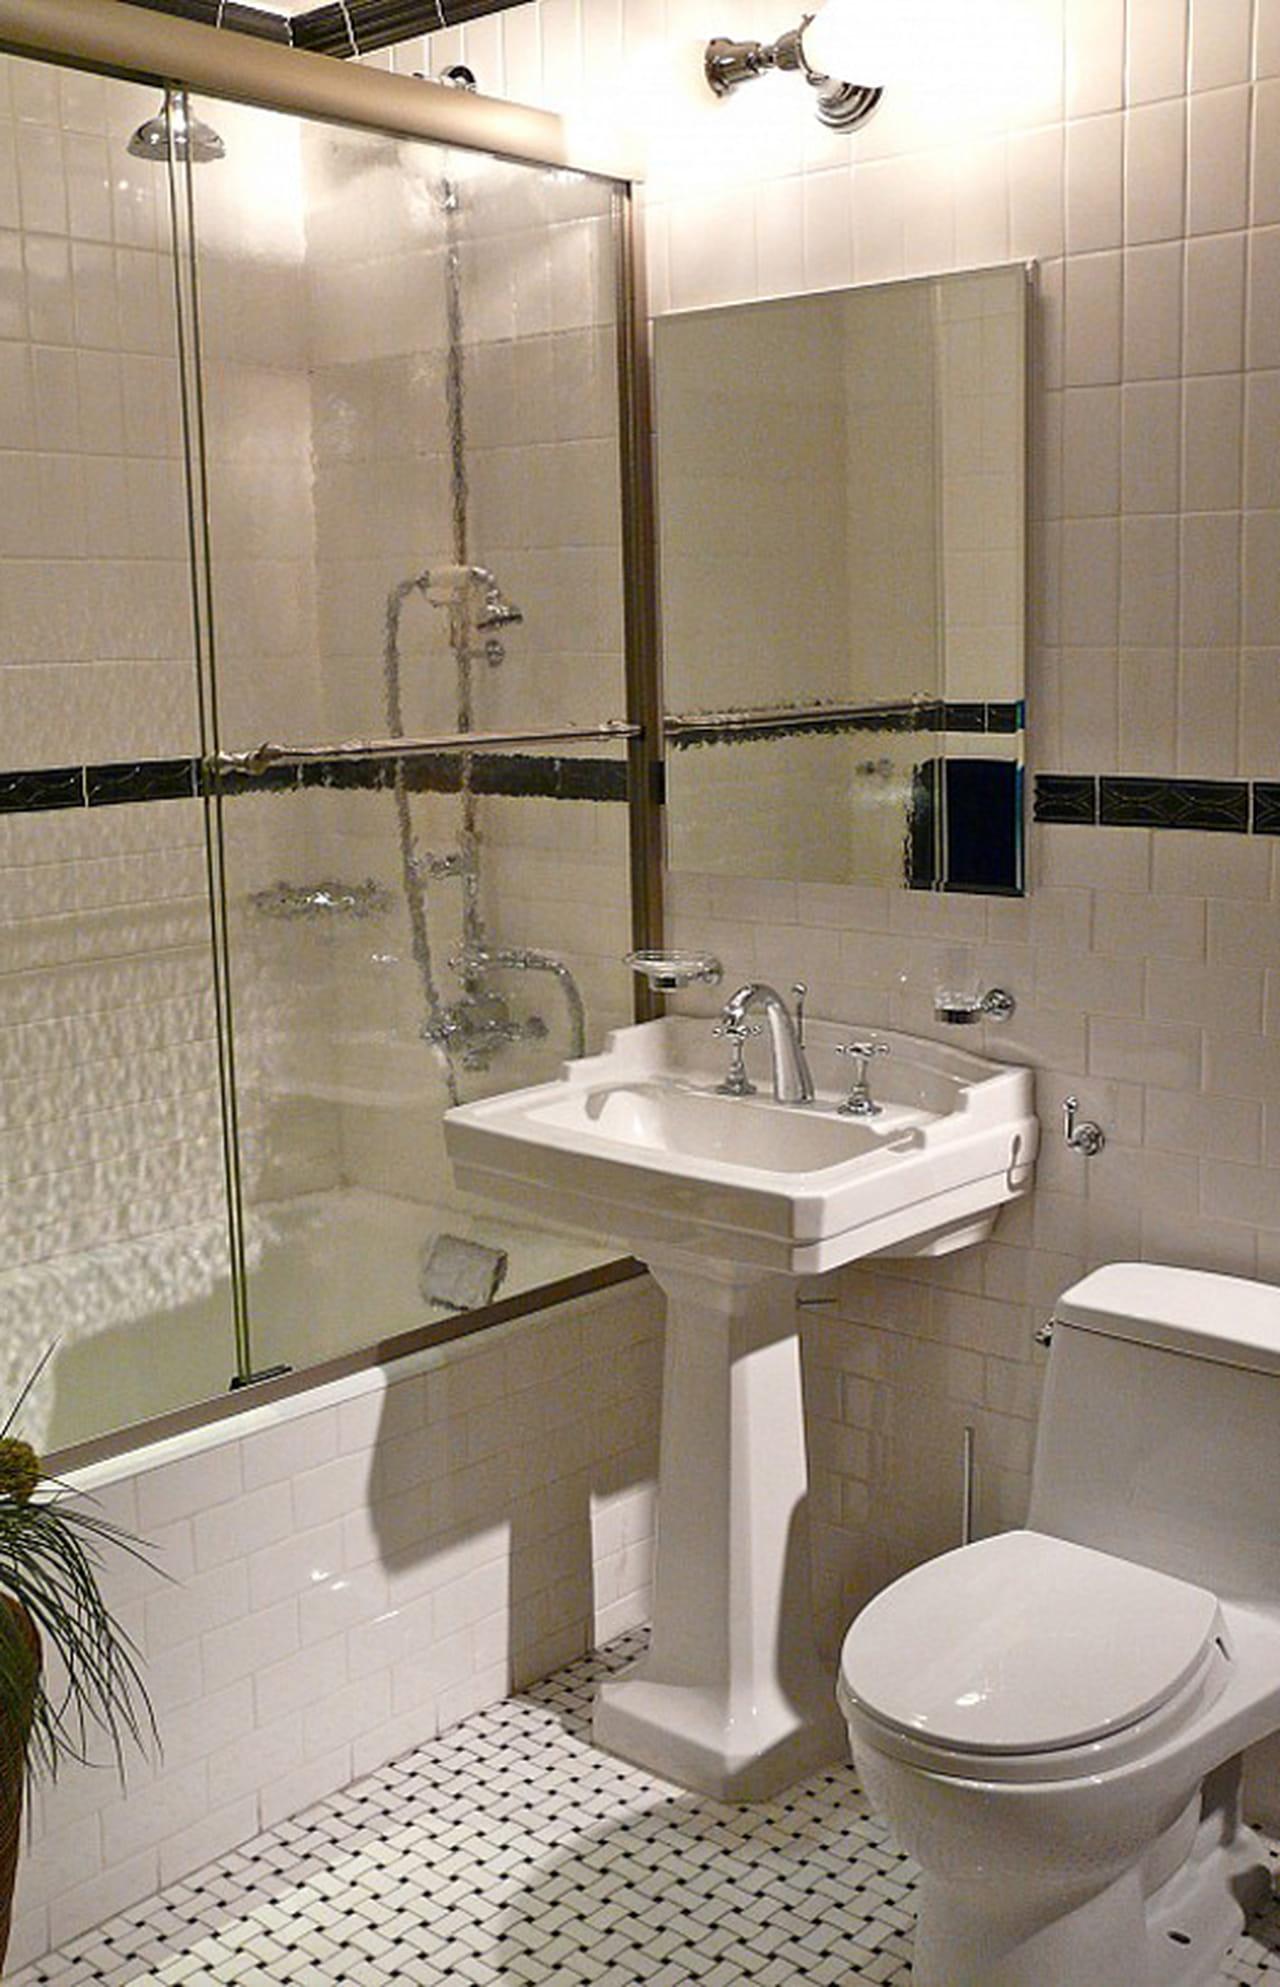 Small Bathroom Setup: أفكار أنيقة وعملية لديكورات الحمام صغير المساحة